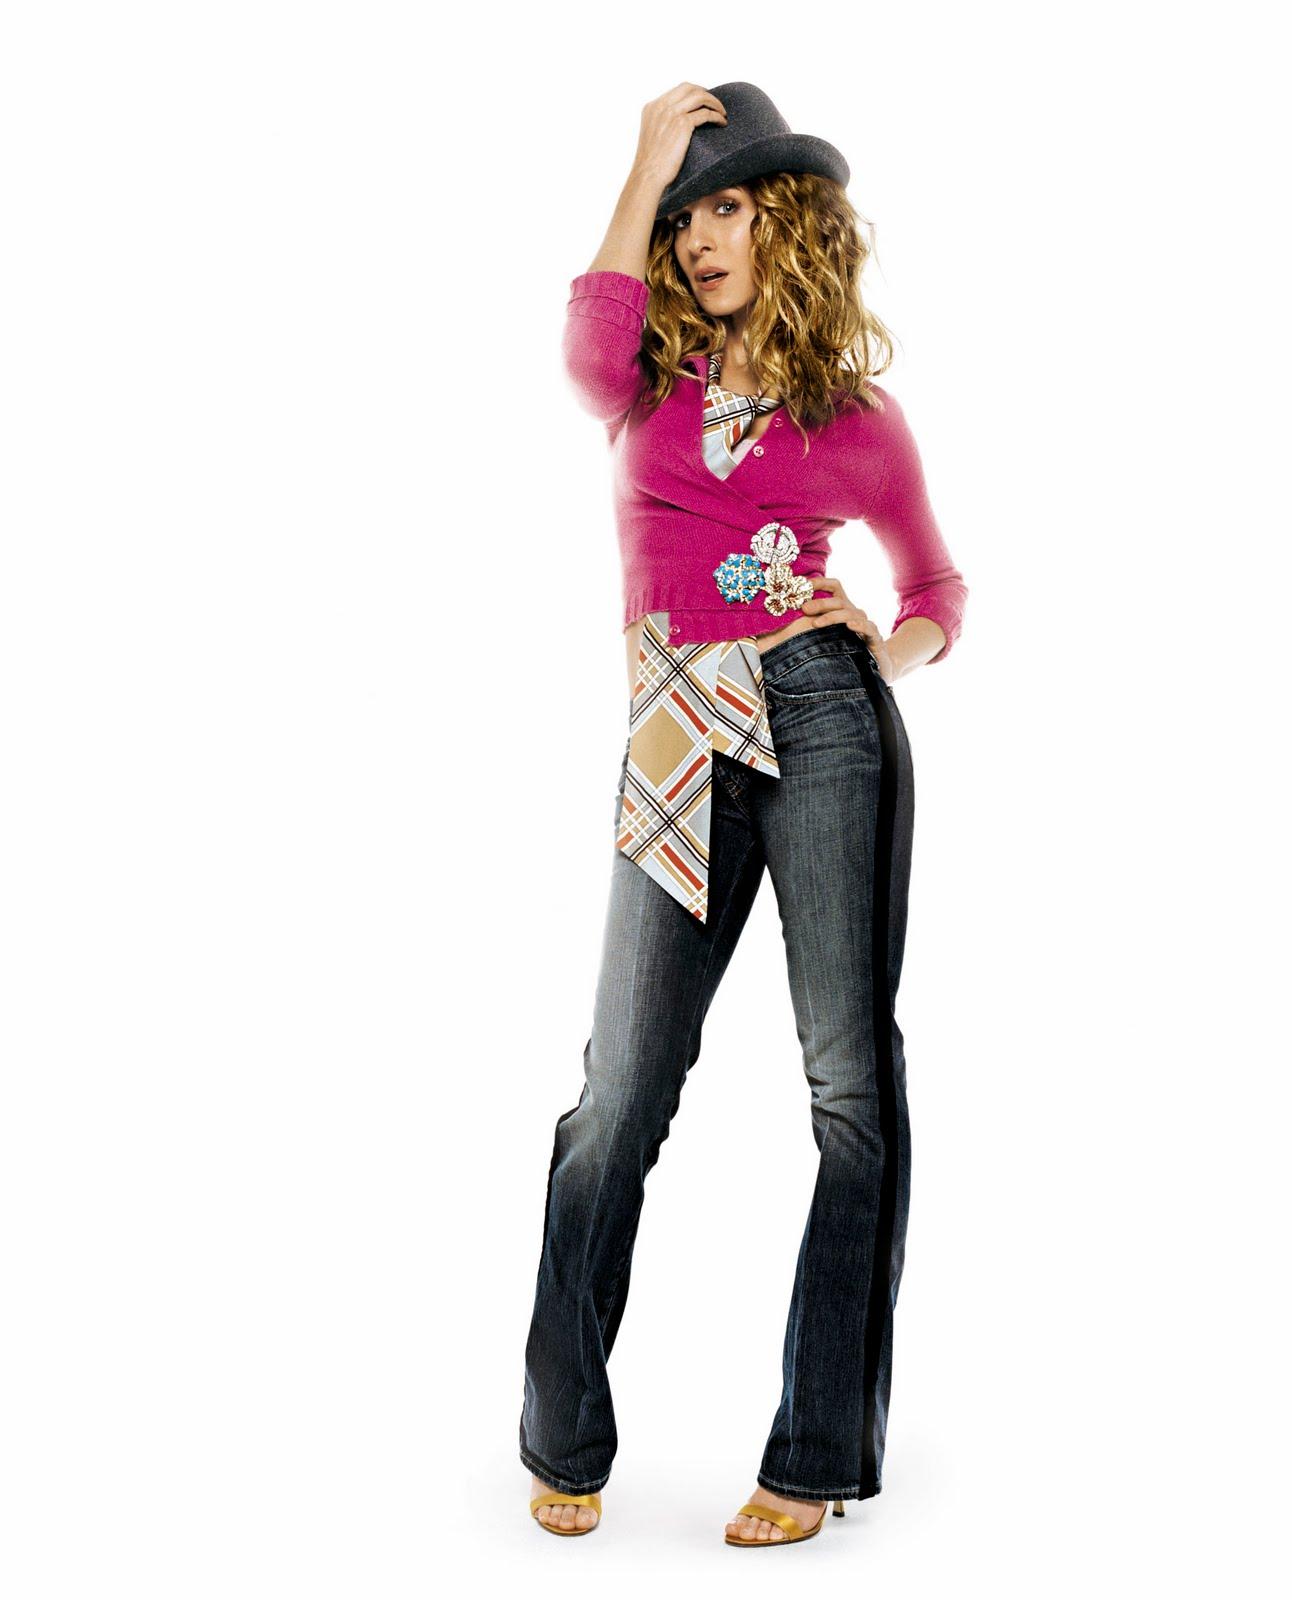 http://4.bp.blogspot.com/_AXNYoqRICIo/SwLh9IkjBdI/AAAAAAAAABE/ck3vR0bCrEo/s1600/SARAH-JESSICA-PARKER-IN-GAP.jpg